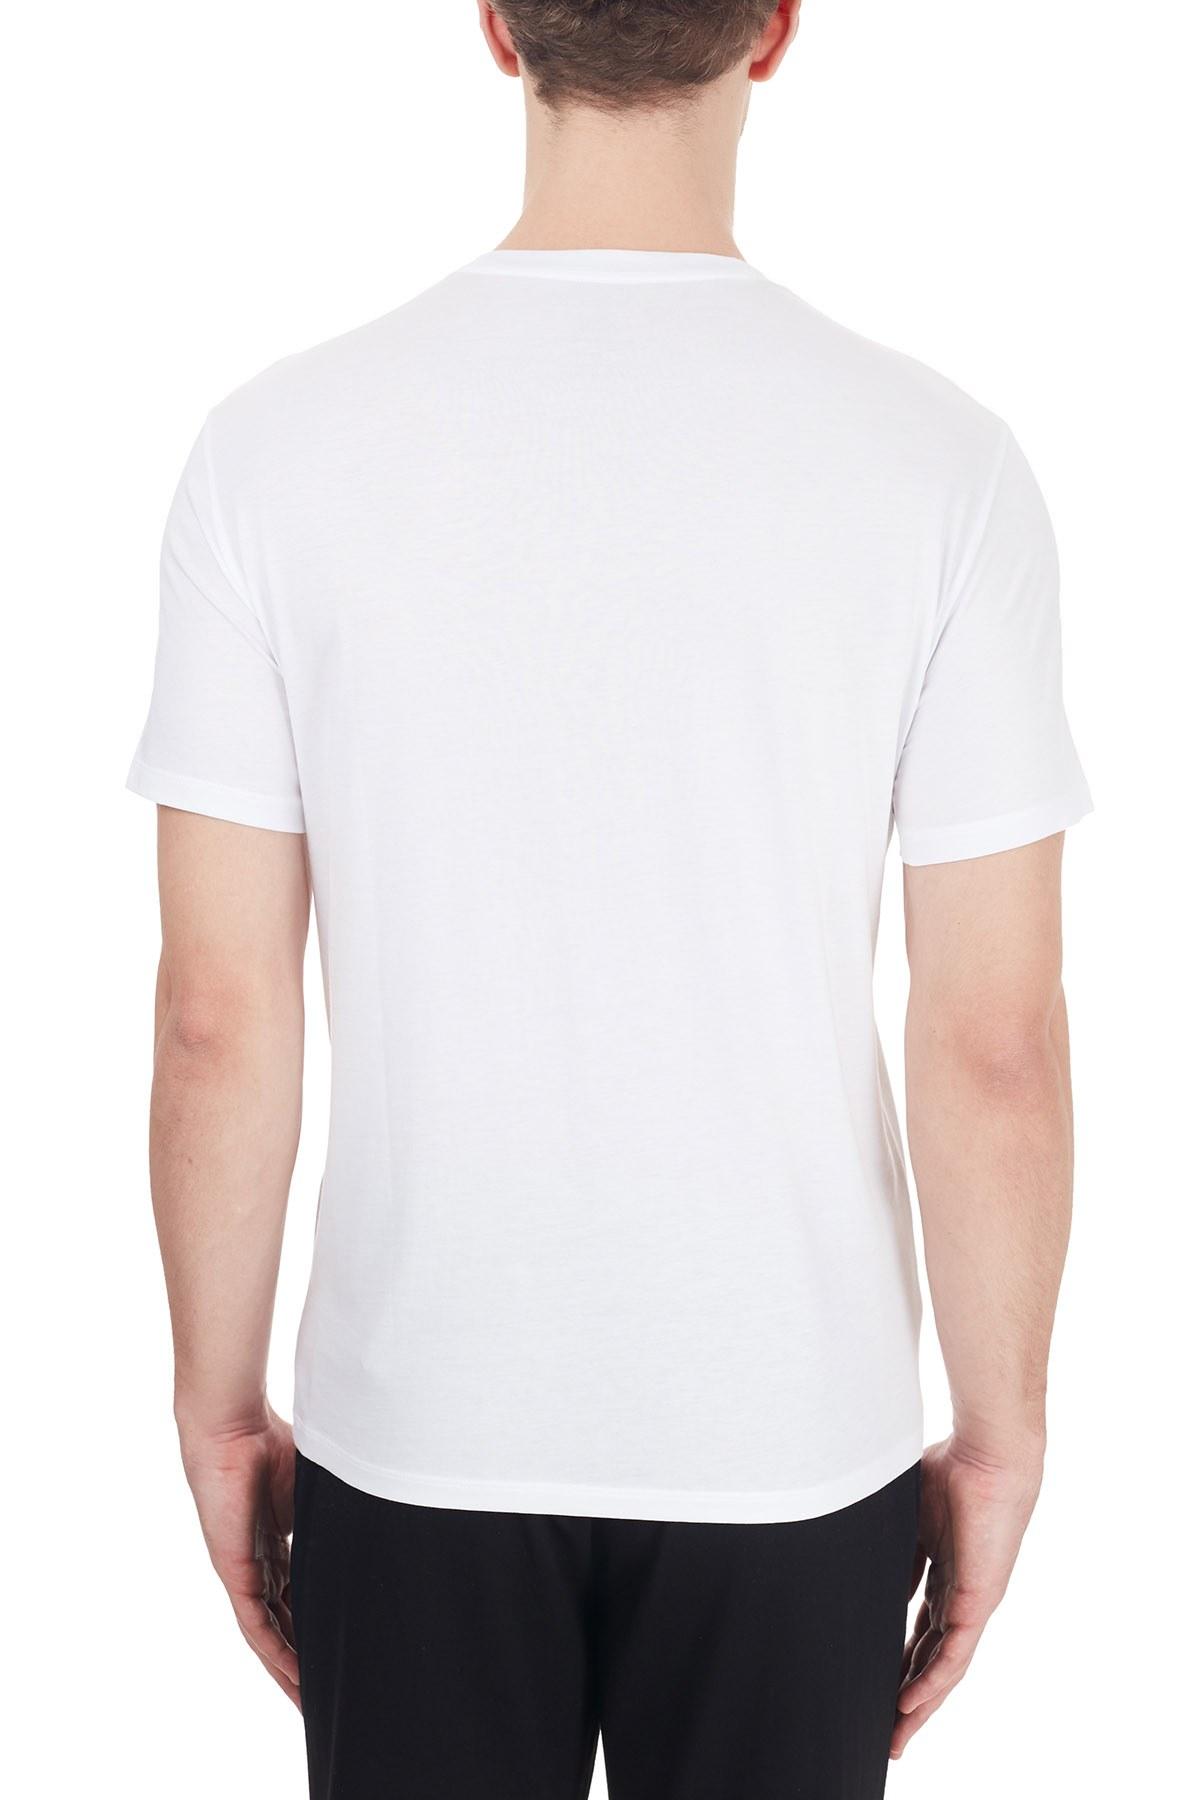 Armani Exchange % 100 Pamuklu Baskılı Bisiklet Yaka Erkek T Shirt 6HZTAH ZJA5Z 1100 BEYAZ